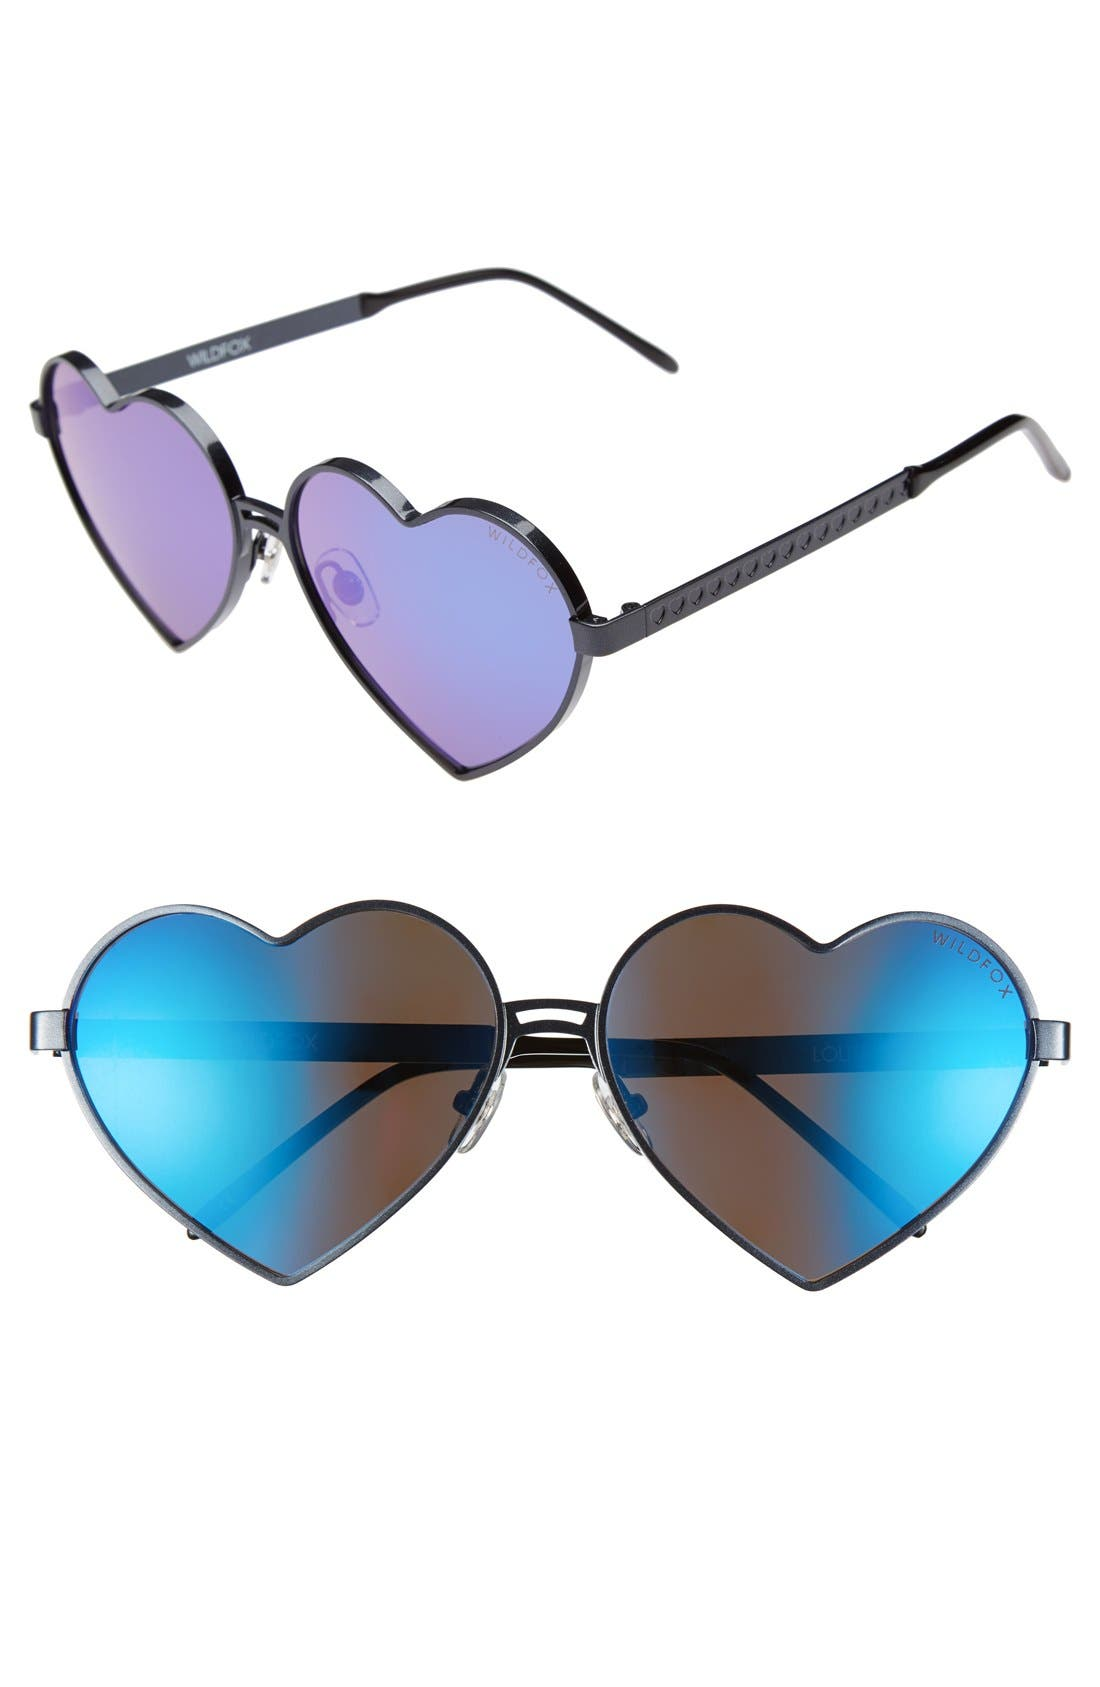 Alternate Image 1 Selected - Wildfox 'Lolita Deluxe' 59mm Sunglasses